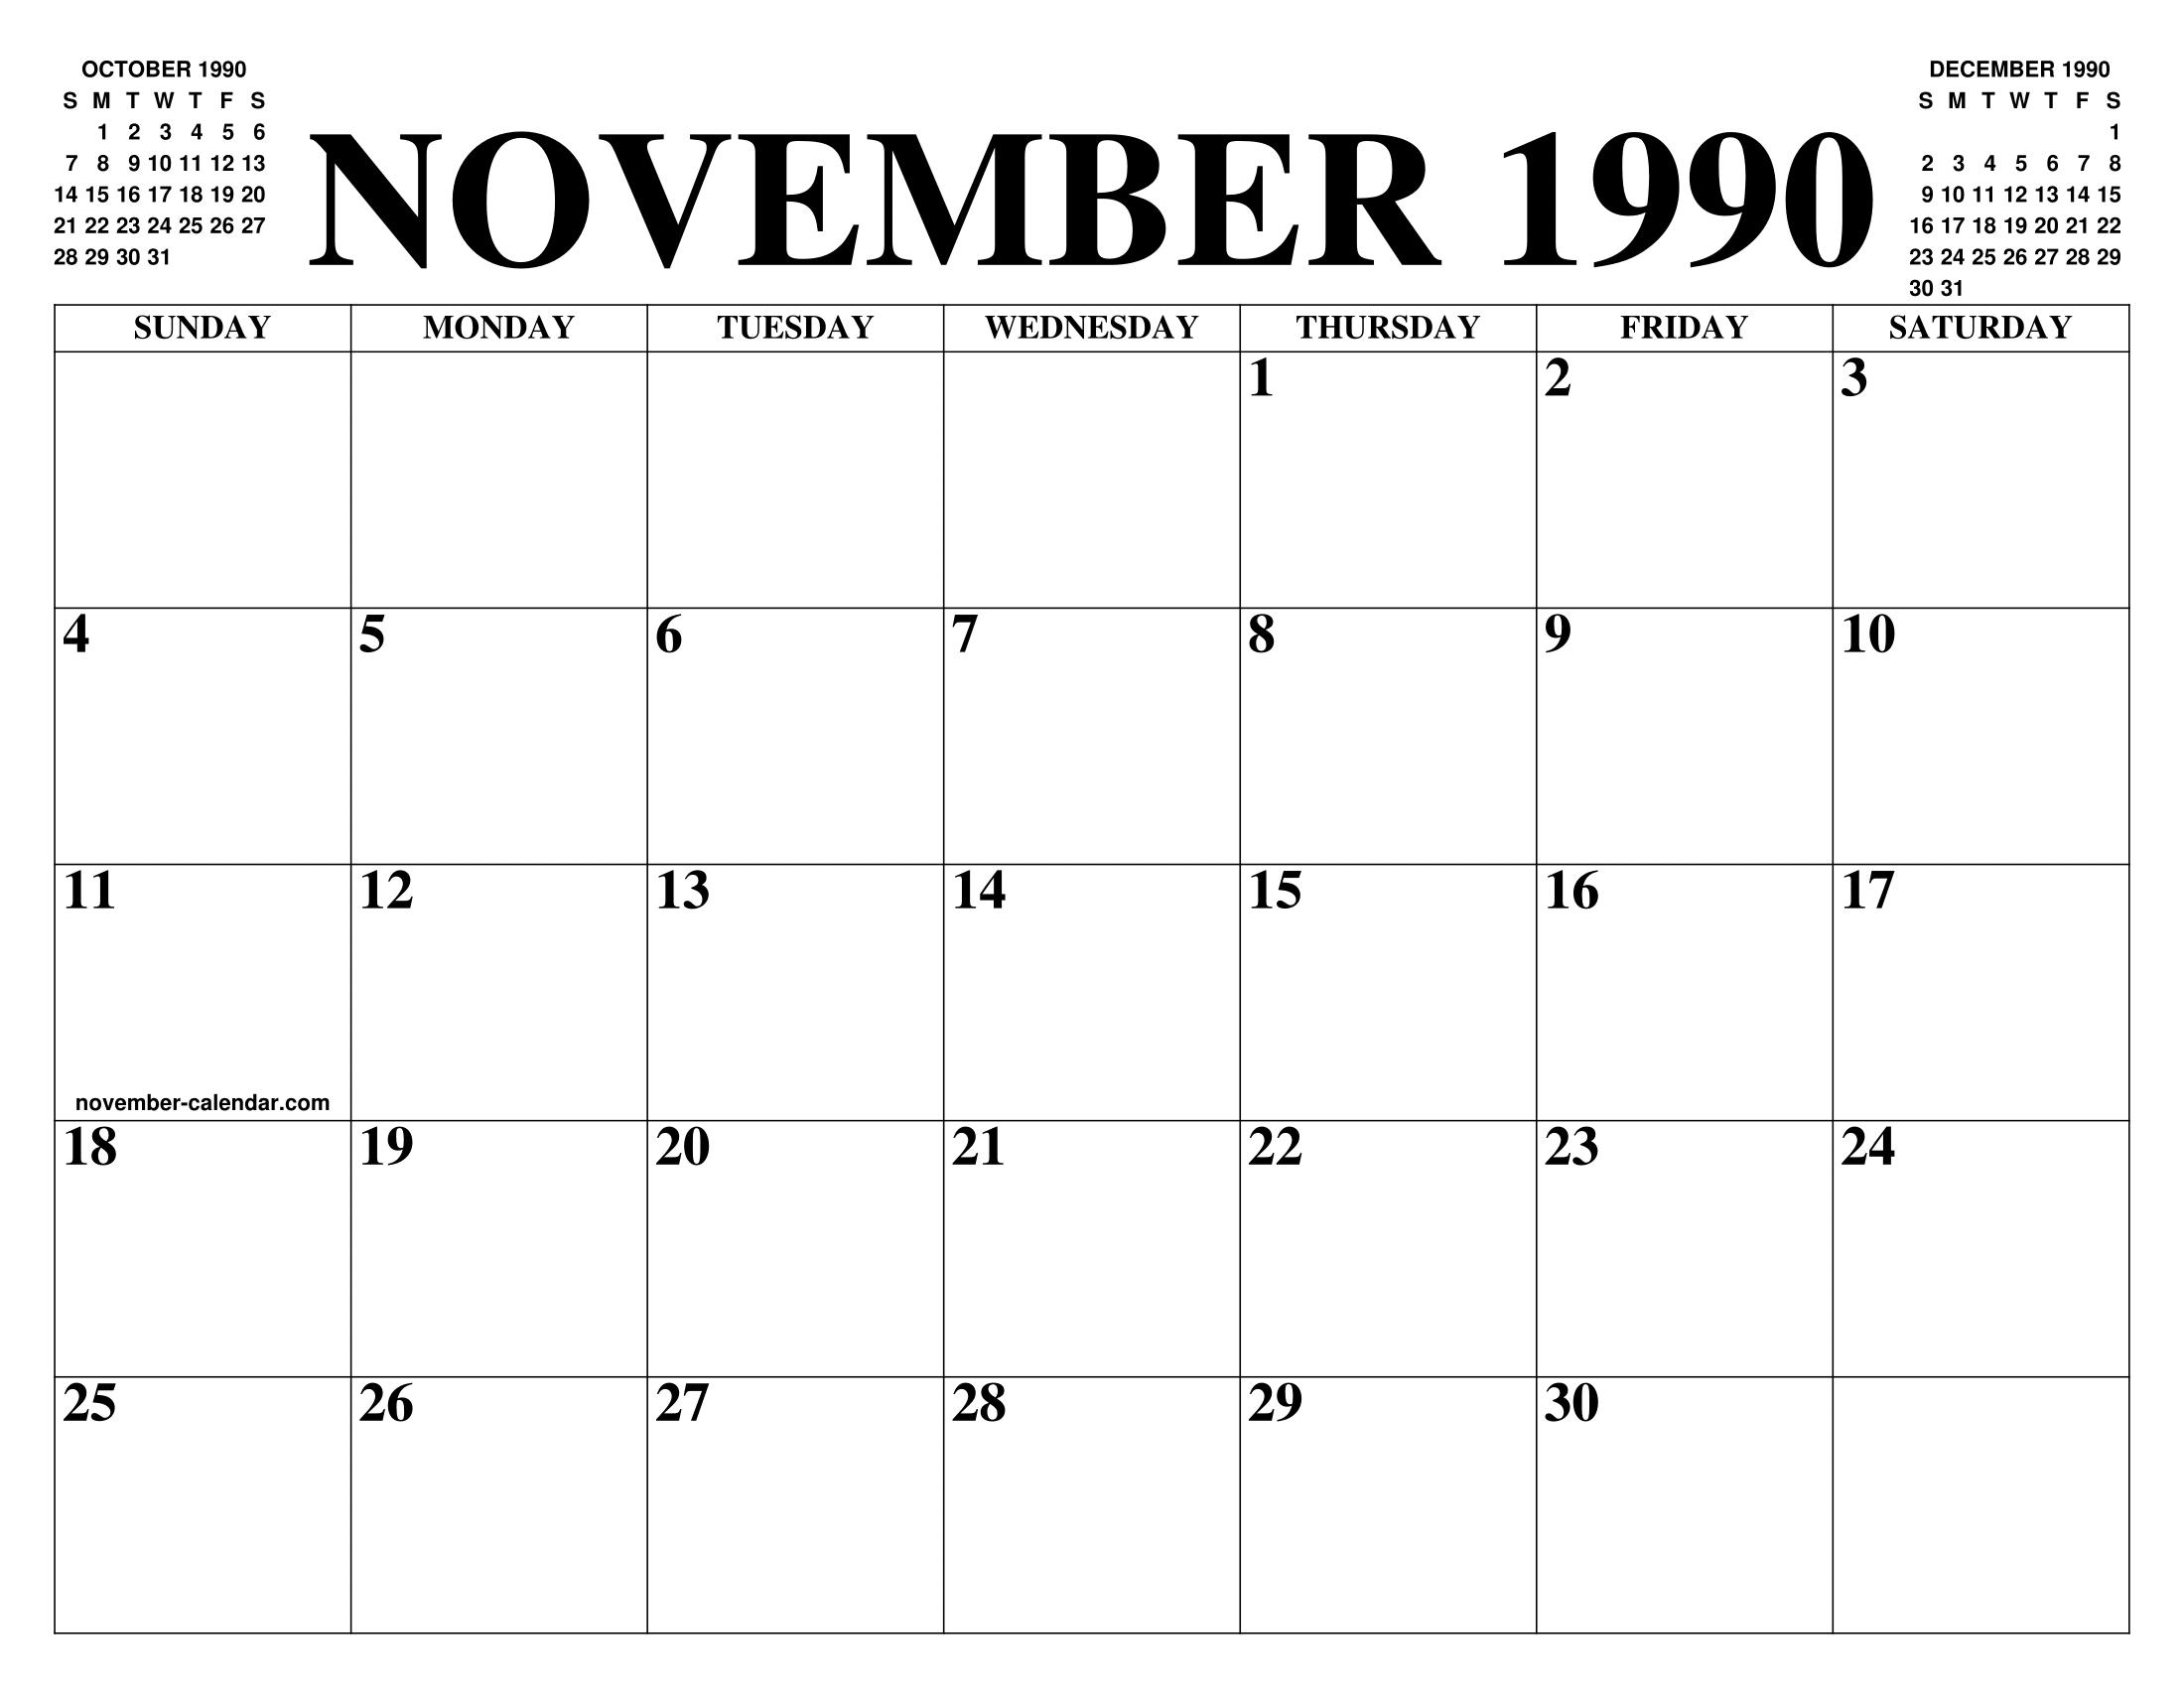 1990 Calendar.November 1990 Calendar Of The Month Free Printable November